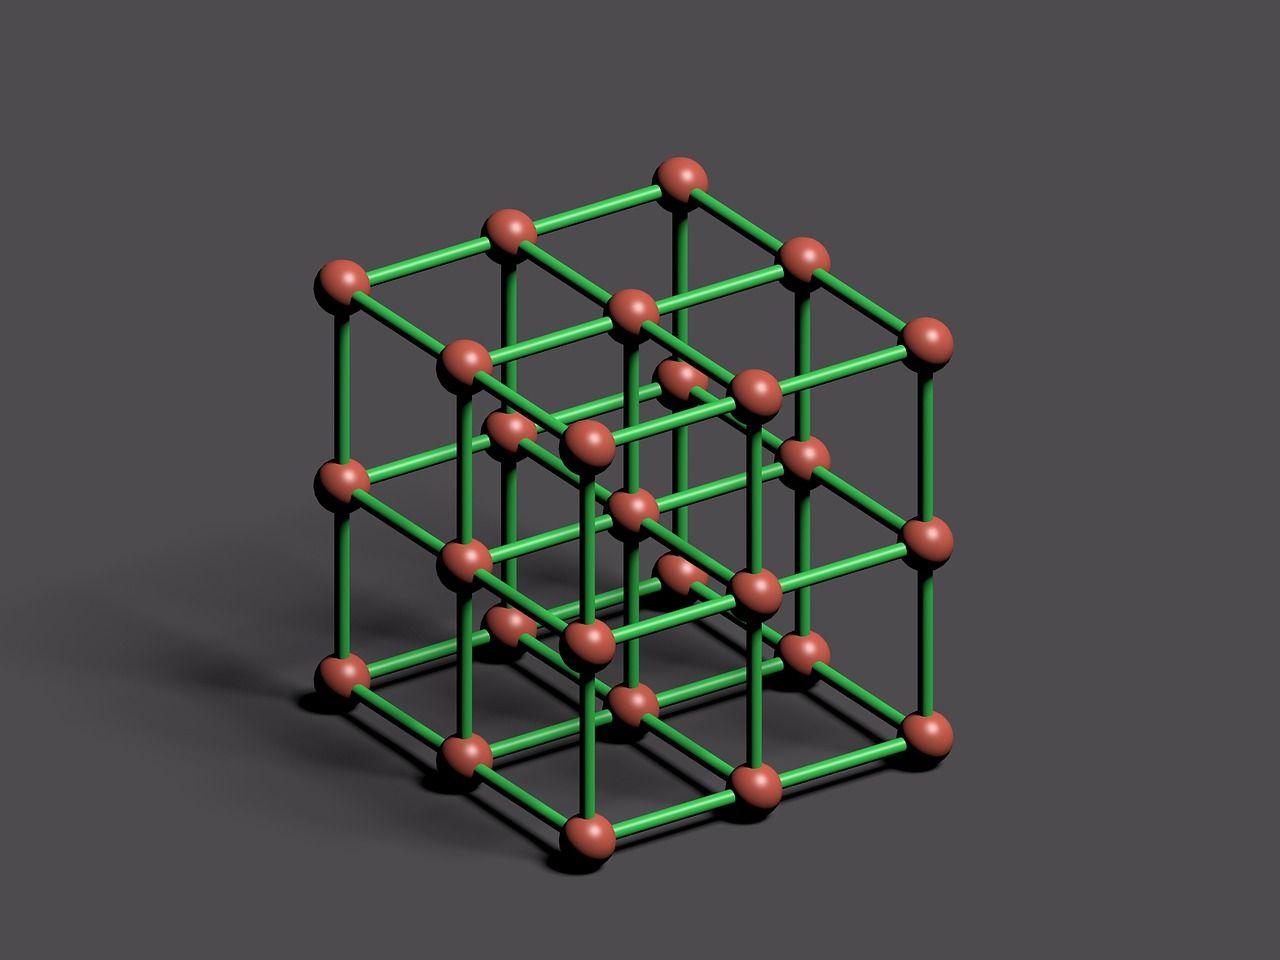 atoms-3630316_1280.jpg